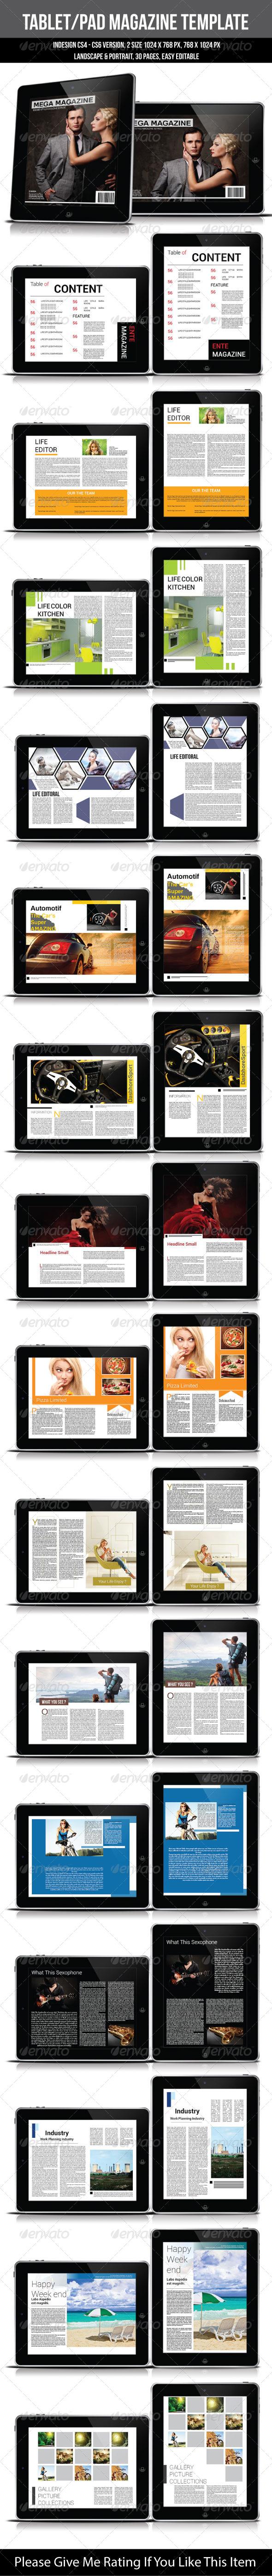 Tablet/Pad Magazine Template - Digital Magazines ePublishing